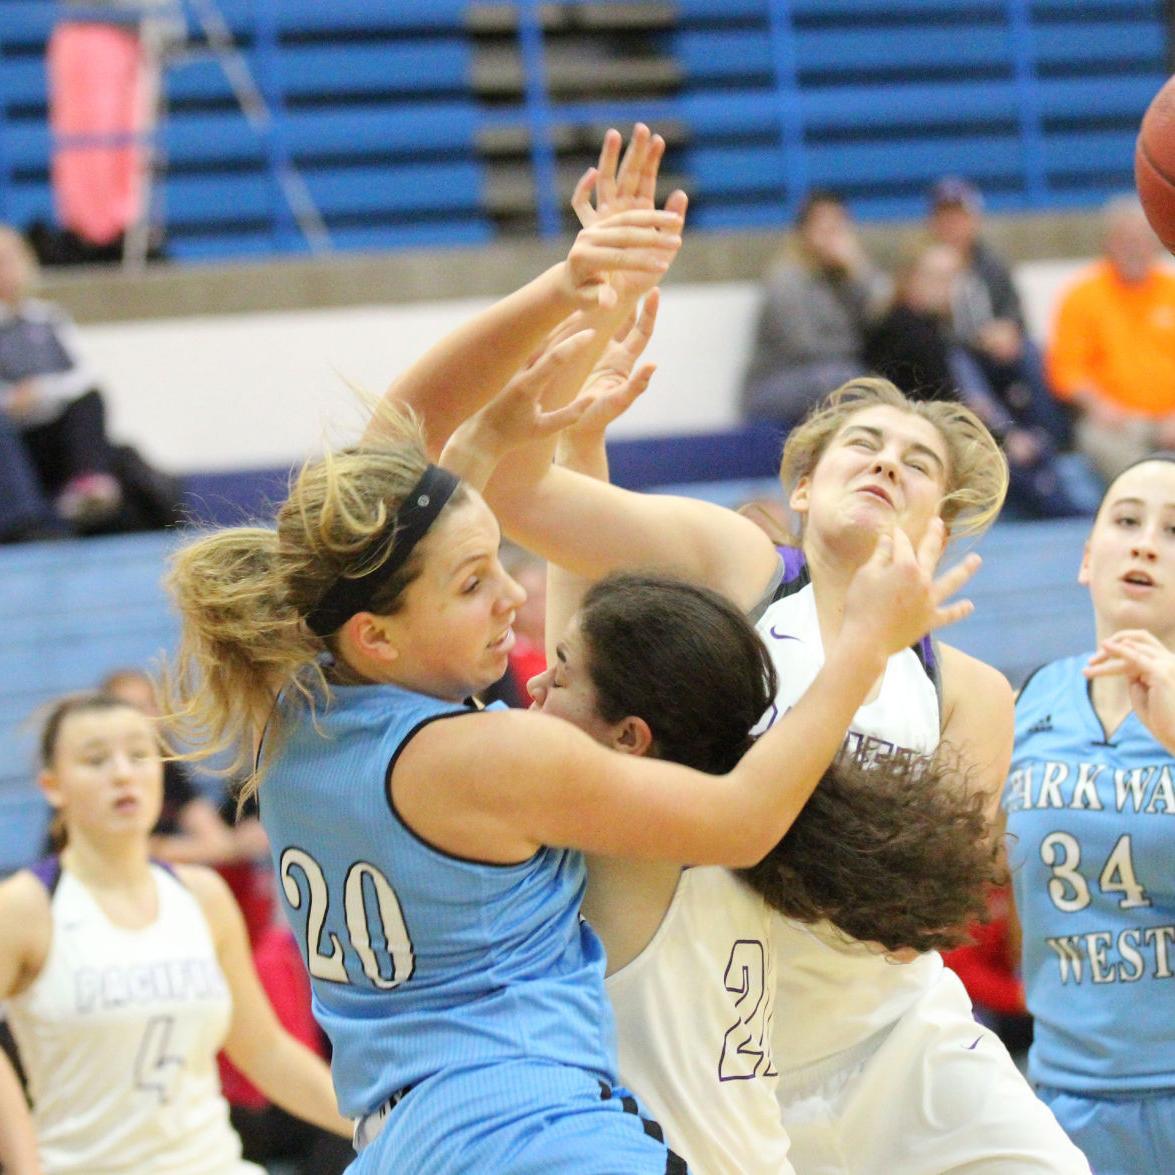 Girls Basketball — Pacific vs. Parkway West, Washington Tournament